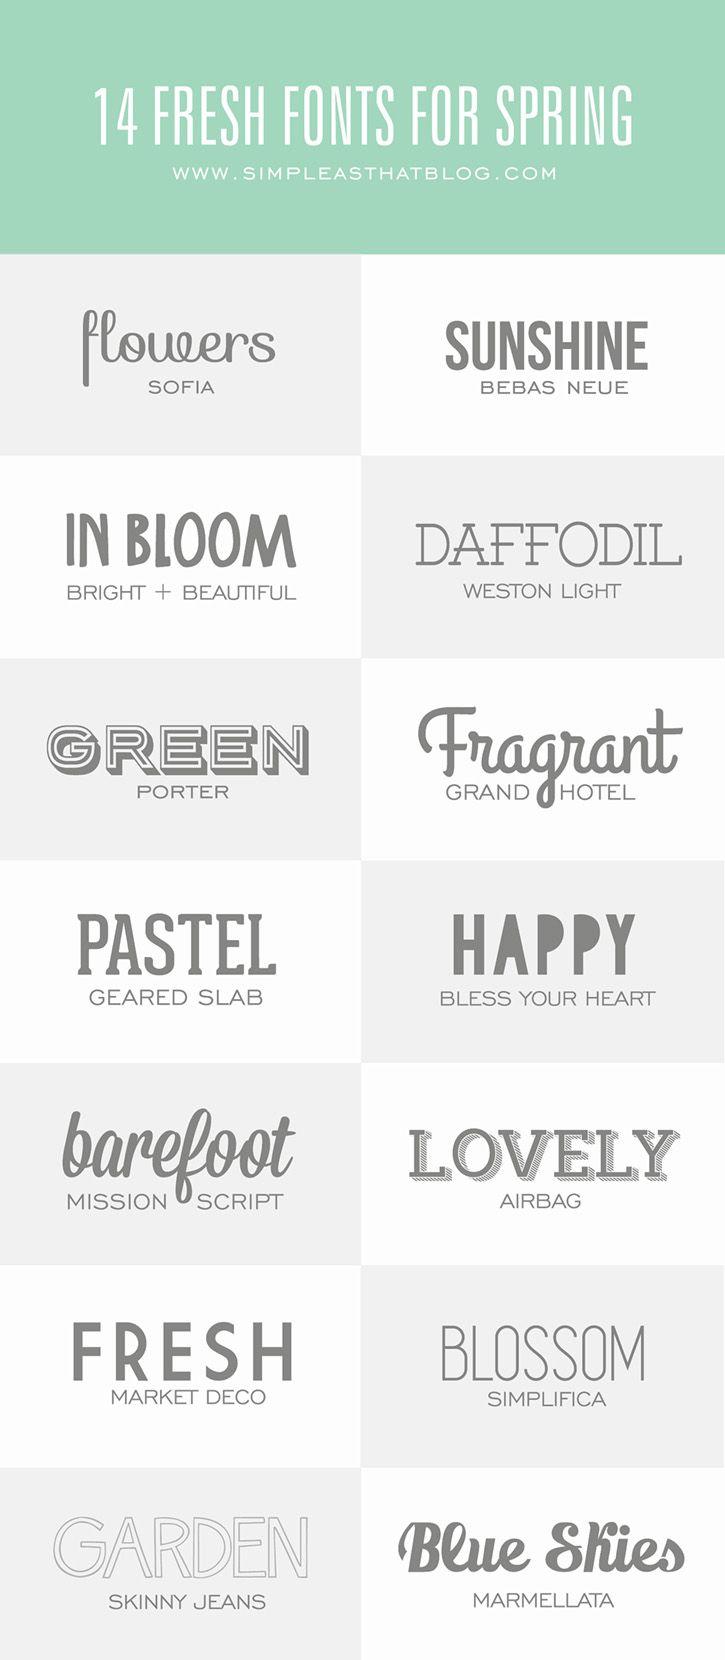 14 Fresh Fonts for Spring | #font #typography #tipografia #fuente #design #diseño #spring #printemps #primavera #fresh